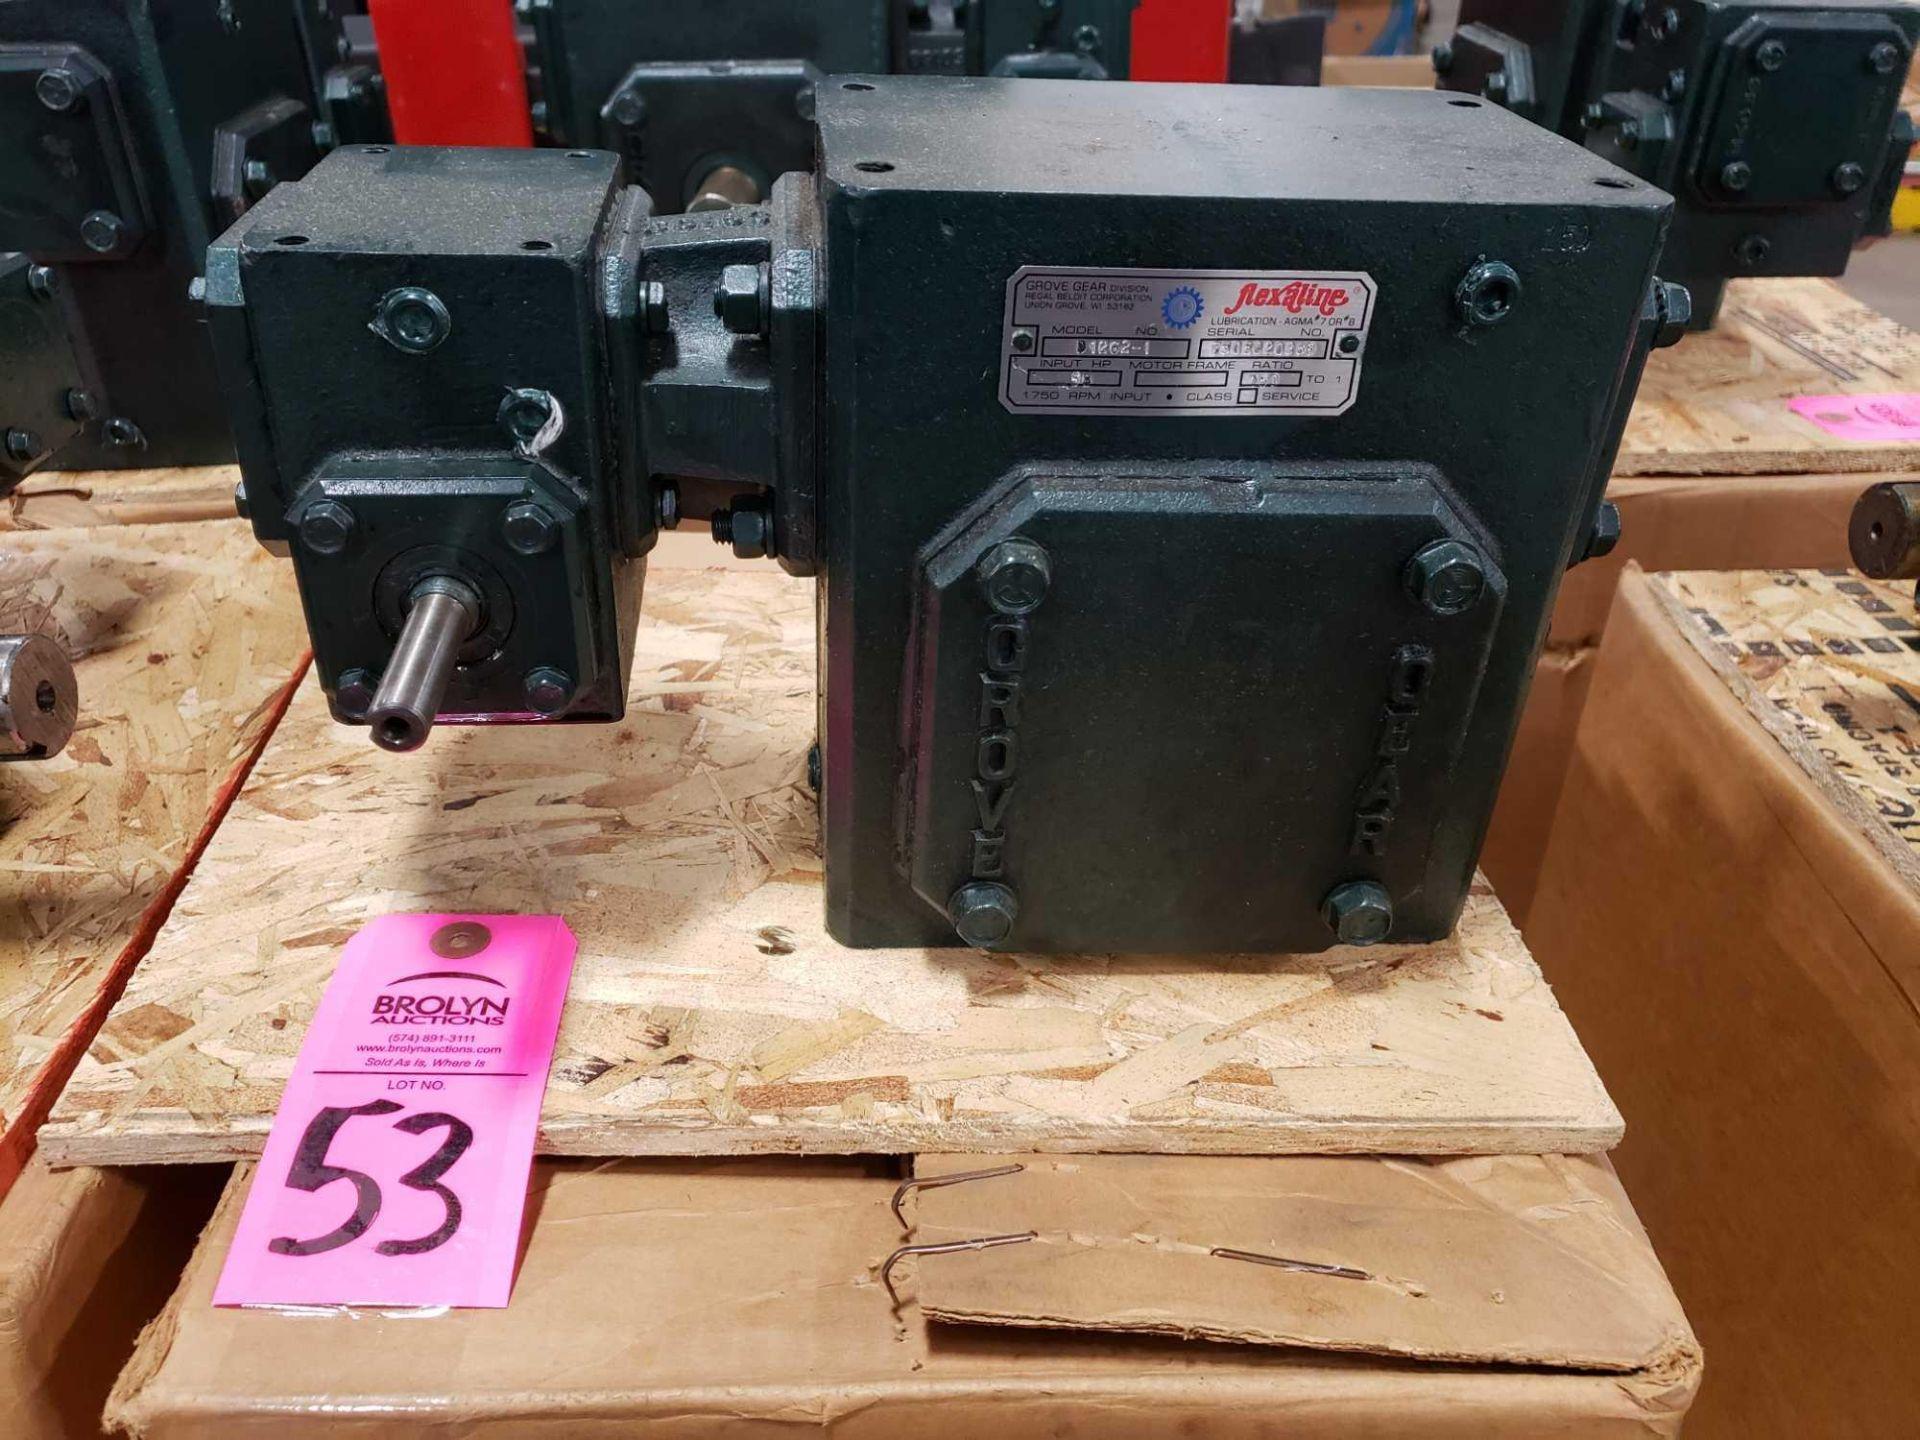 Lot 53 - Grove Gear Flexaline gearbox worm gear speed reducer model D1262-1, ratio 150:1. New in box.